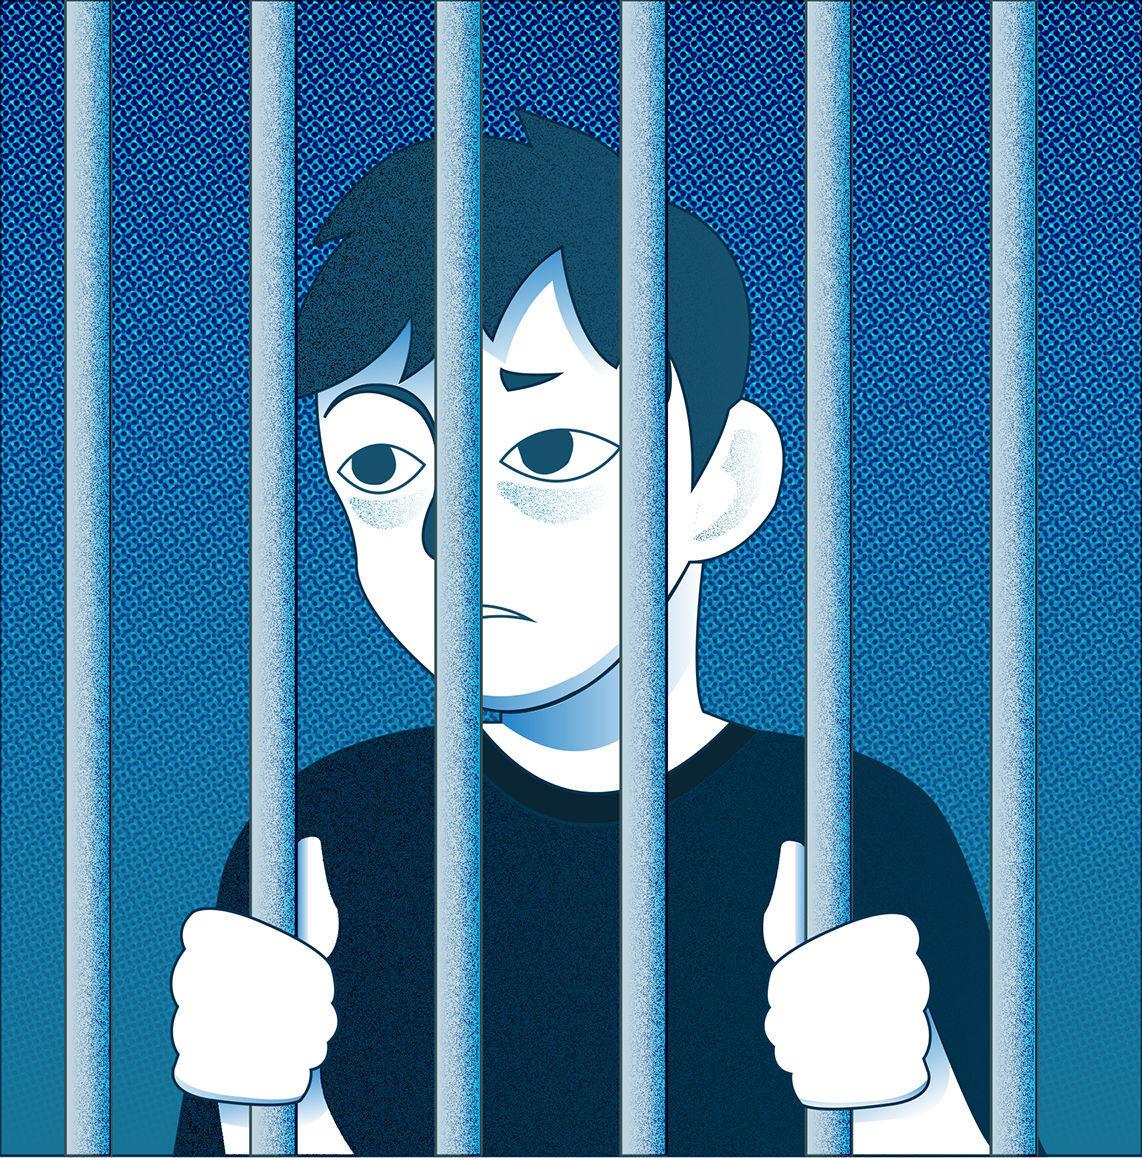 bullying criminalization